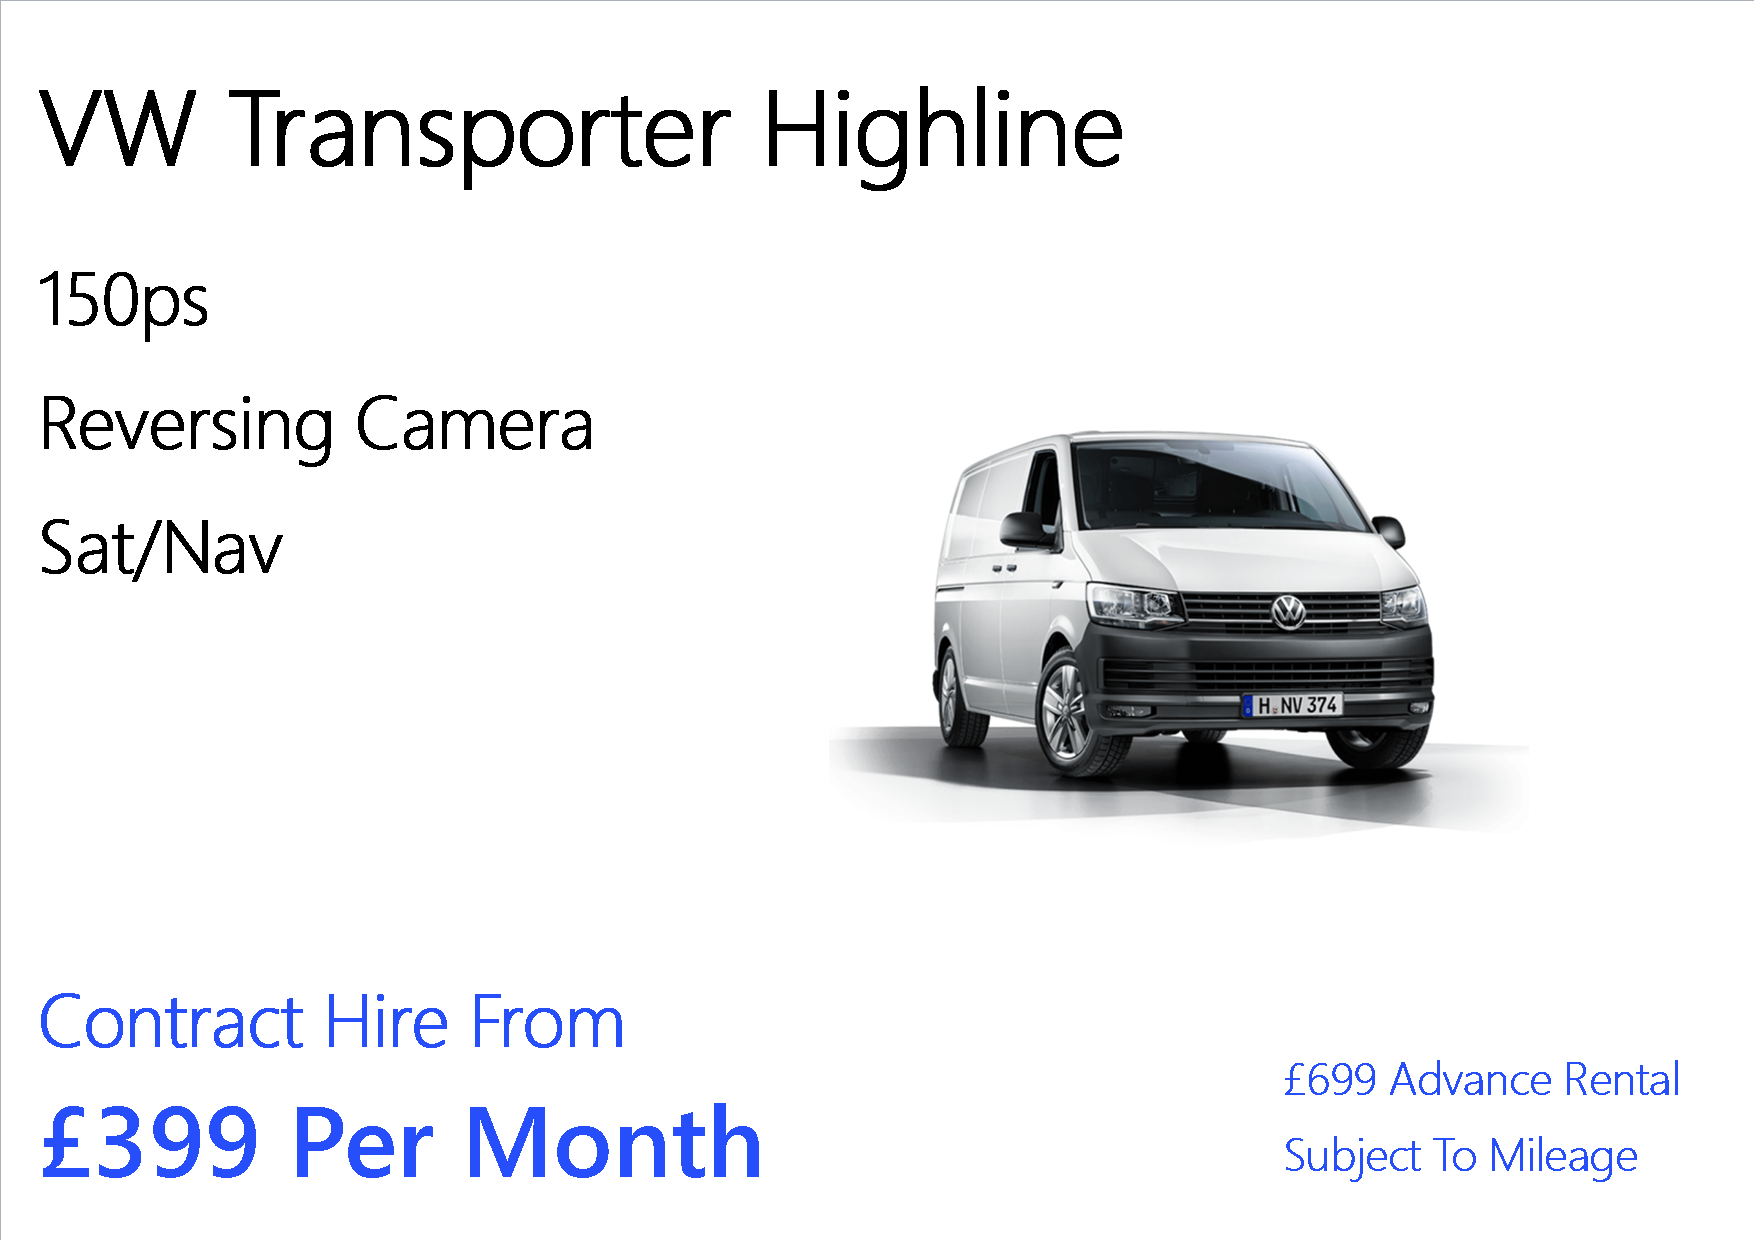 vw-transporter-highline-slide